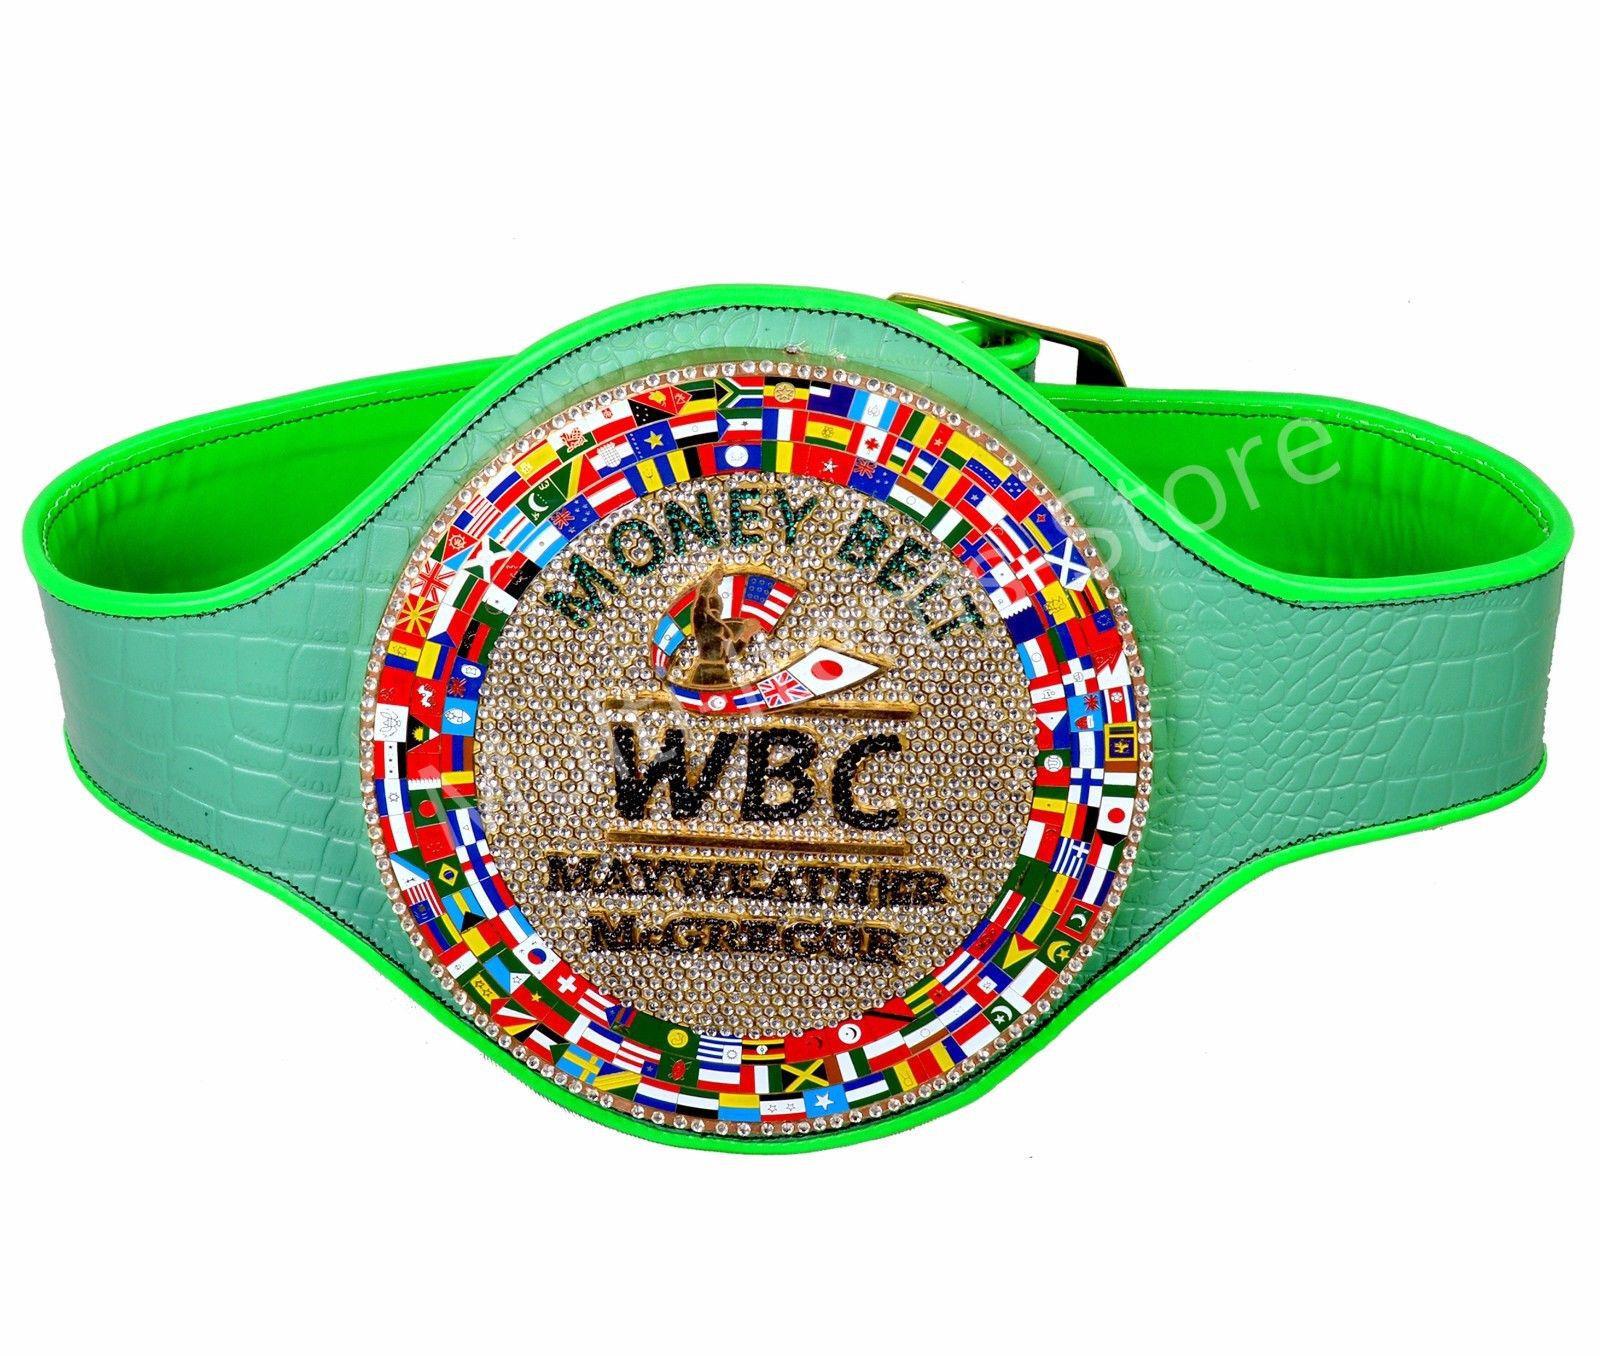 Beautiful WBC MONEY BELT MAYWEATHER MCGREGOR Fight Replica Belt With Extra Pearl